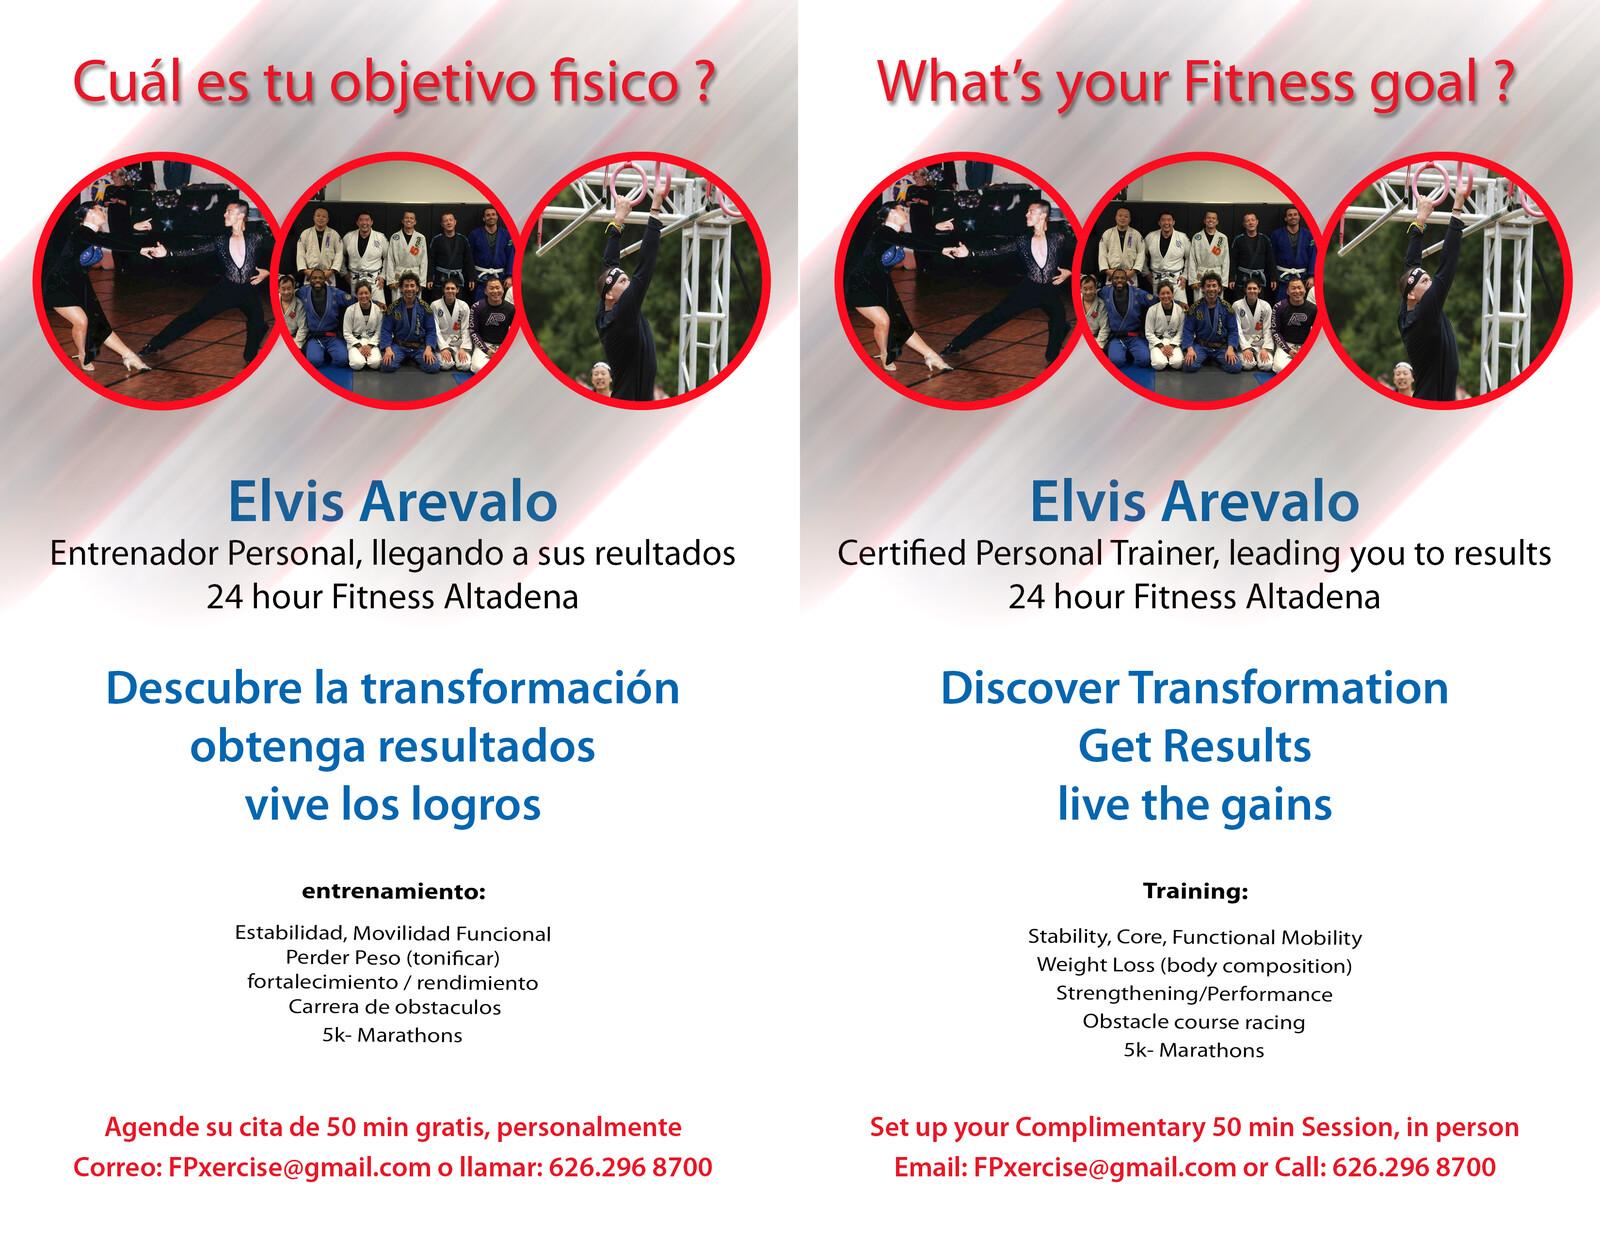 Spanish English Promotional brochure